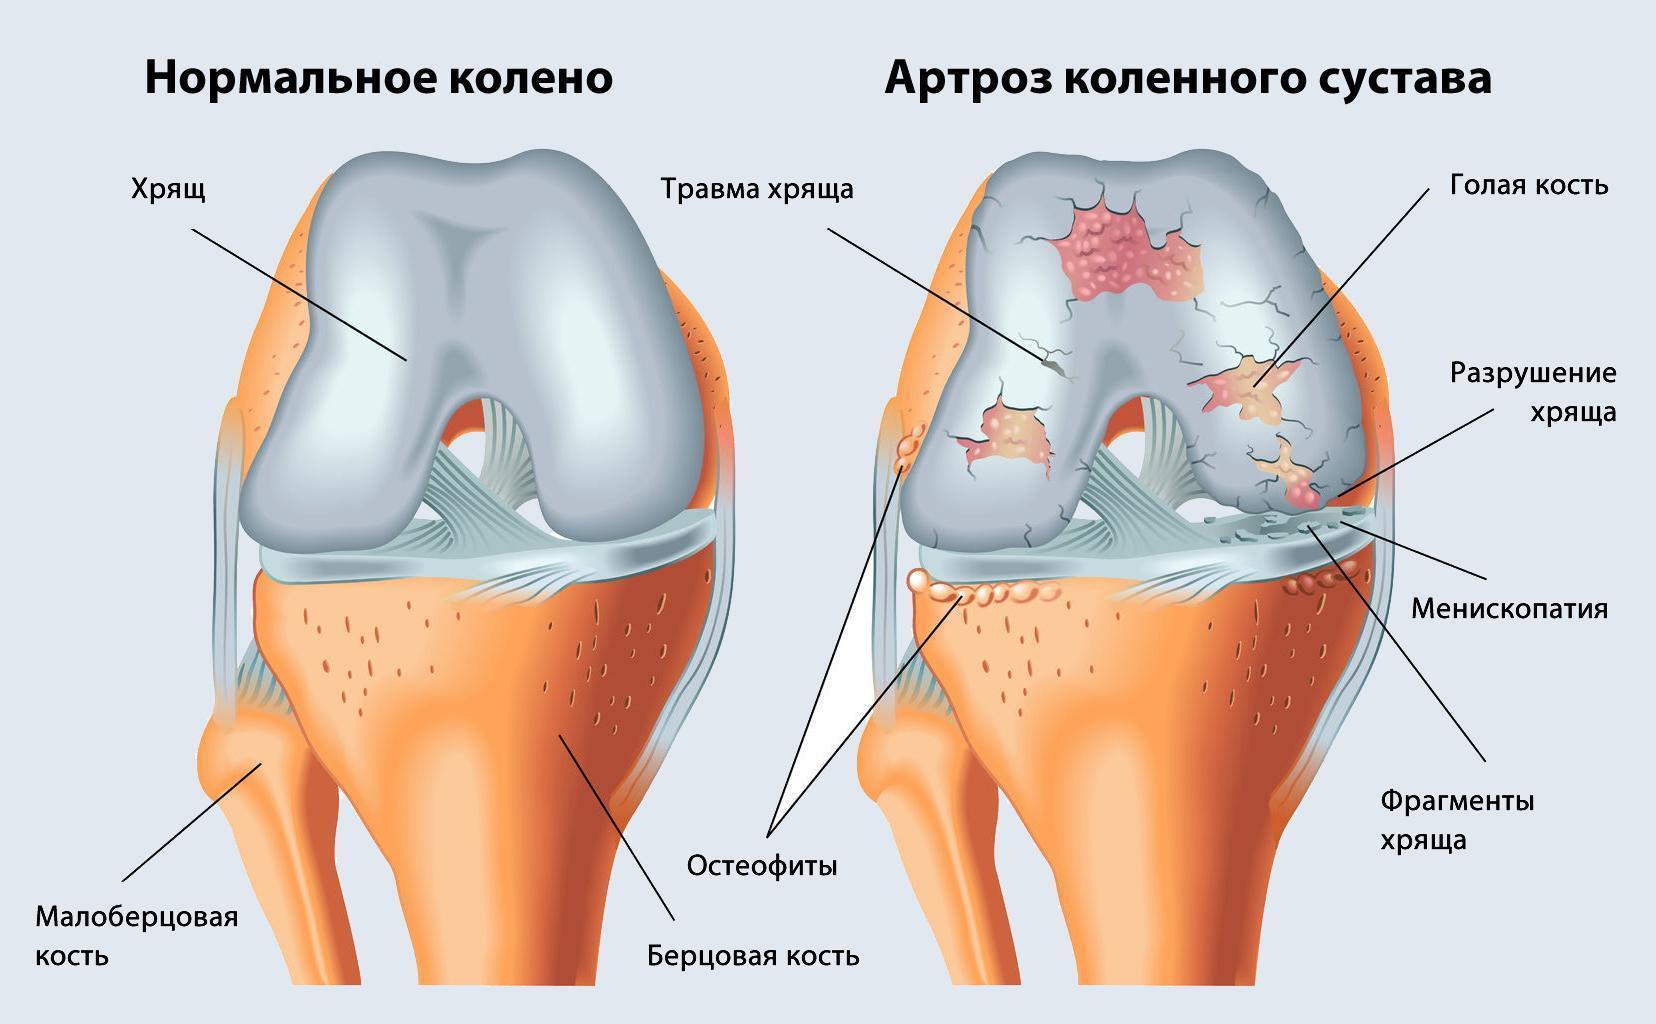 Артроз: остеоартроз, остеоартрит, артрозоартрит